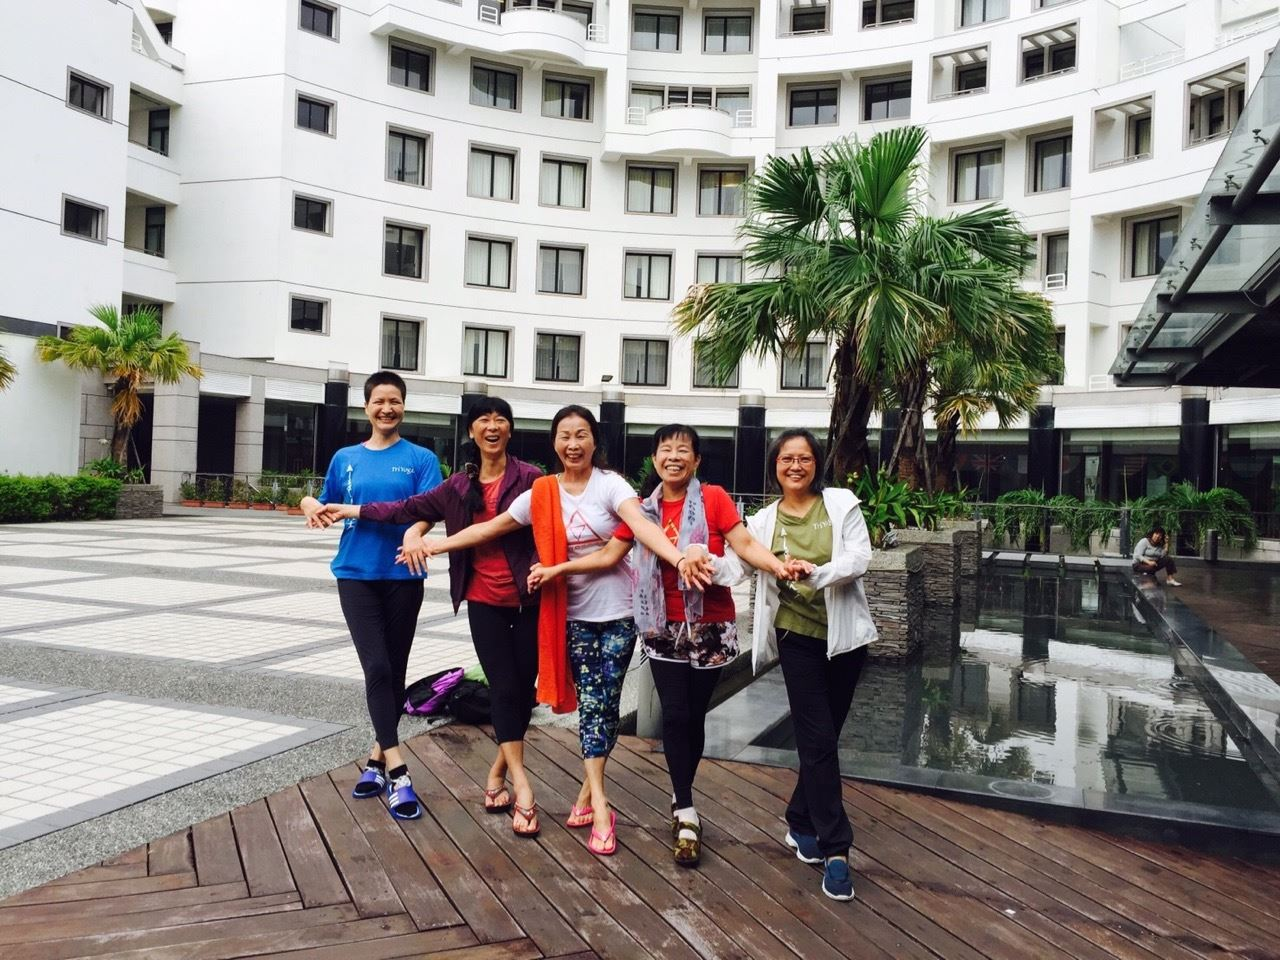 Fun Training Group!